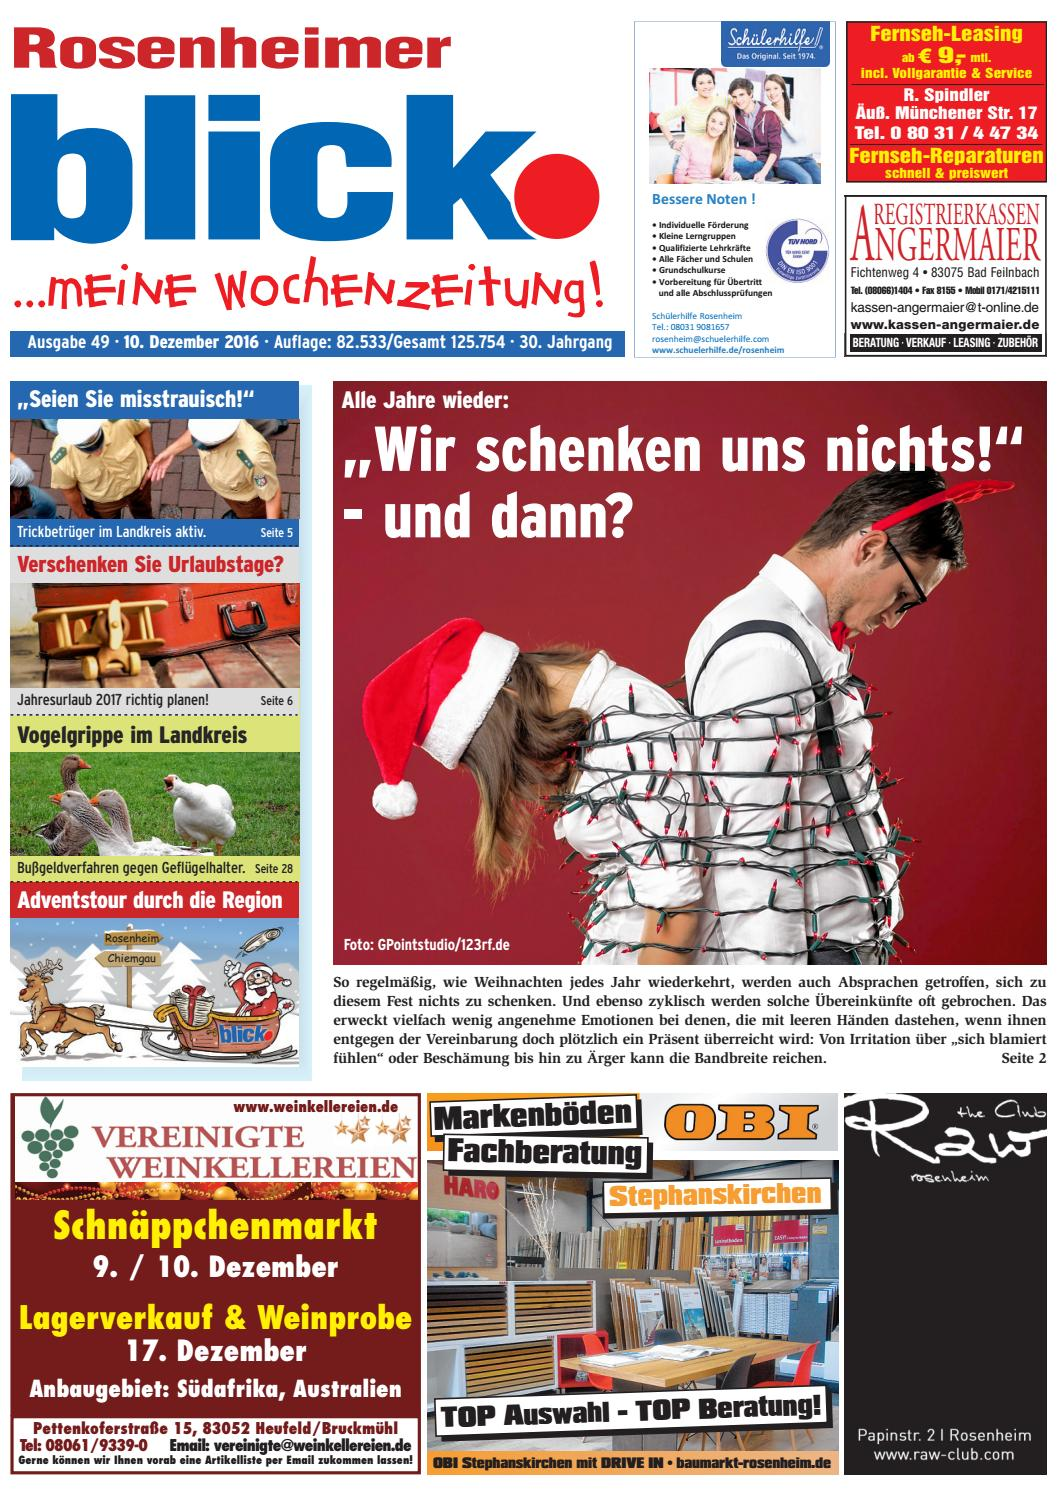 Rosenheimer blick - Ausgabe 49 | 2016 by Blickpunkt Verlag - issuu